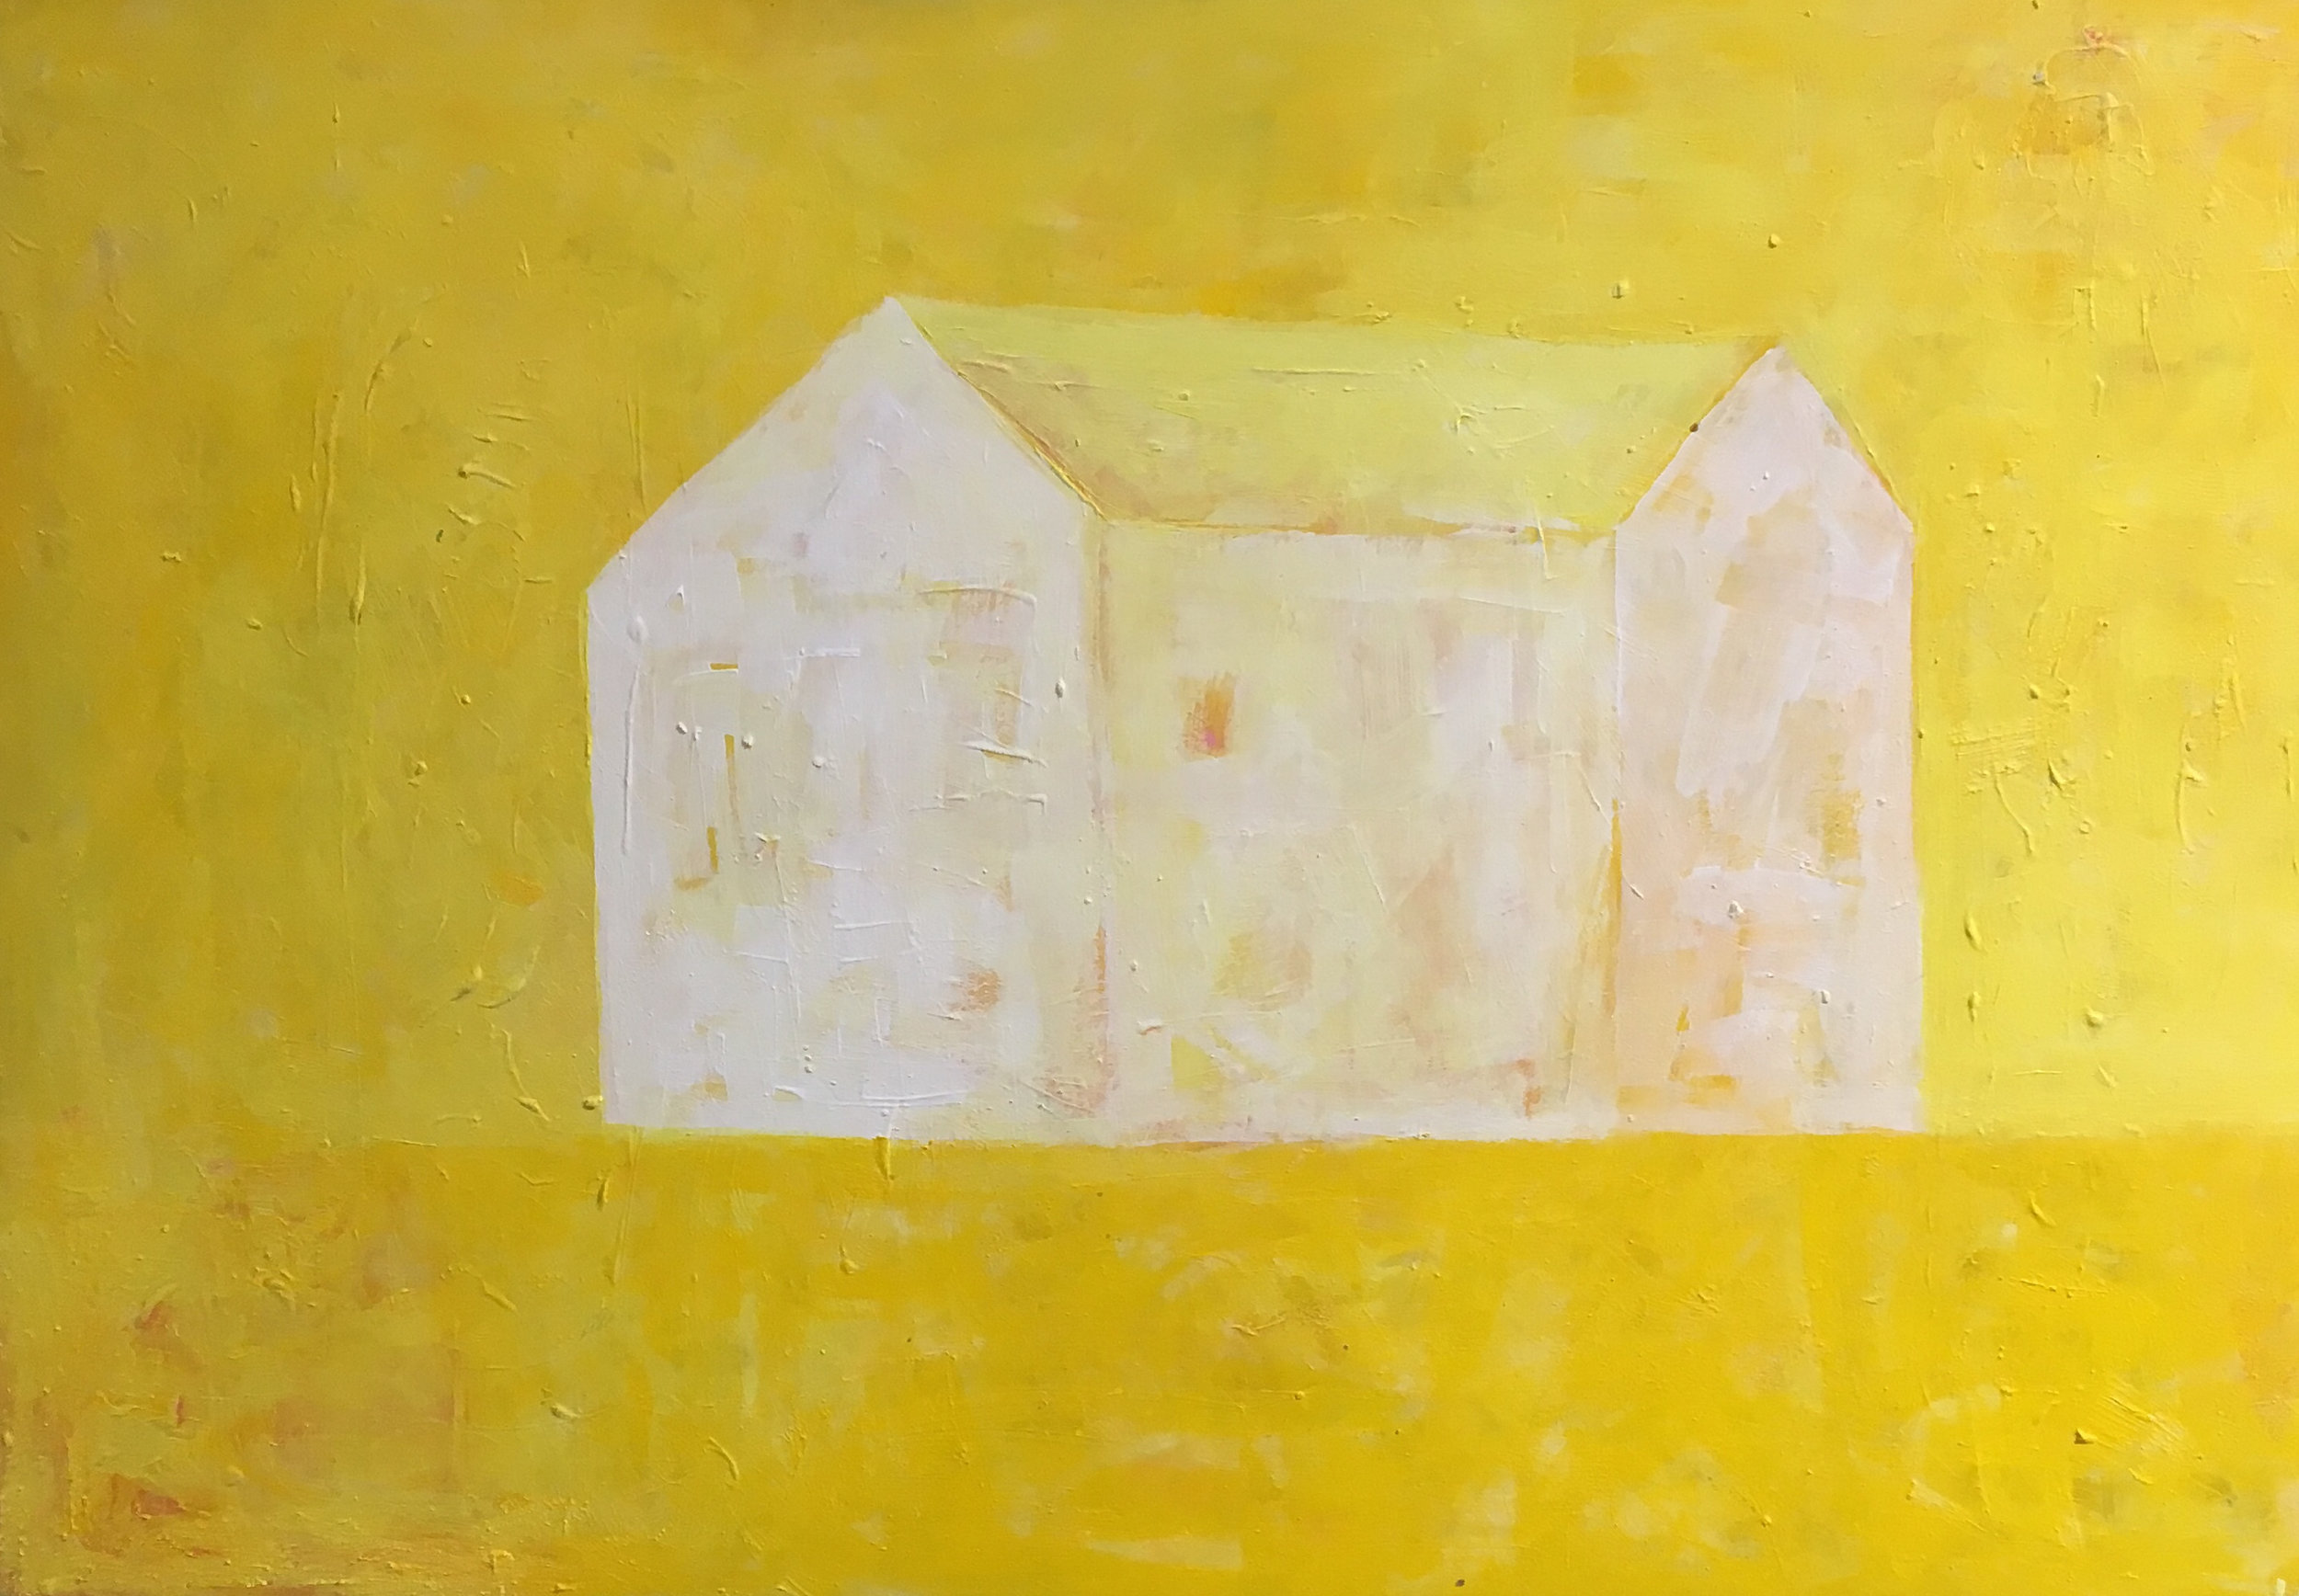 Ia, vitt hus, gul bakgrund.jpg